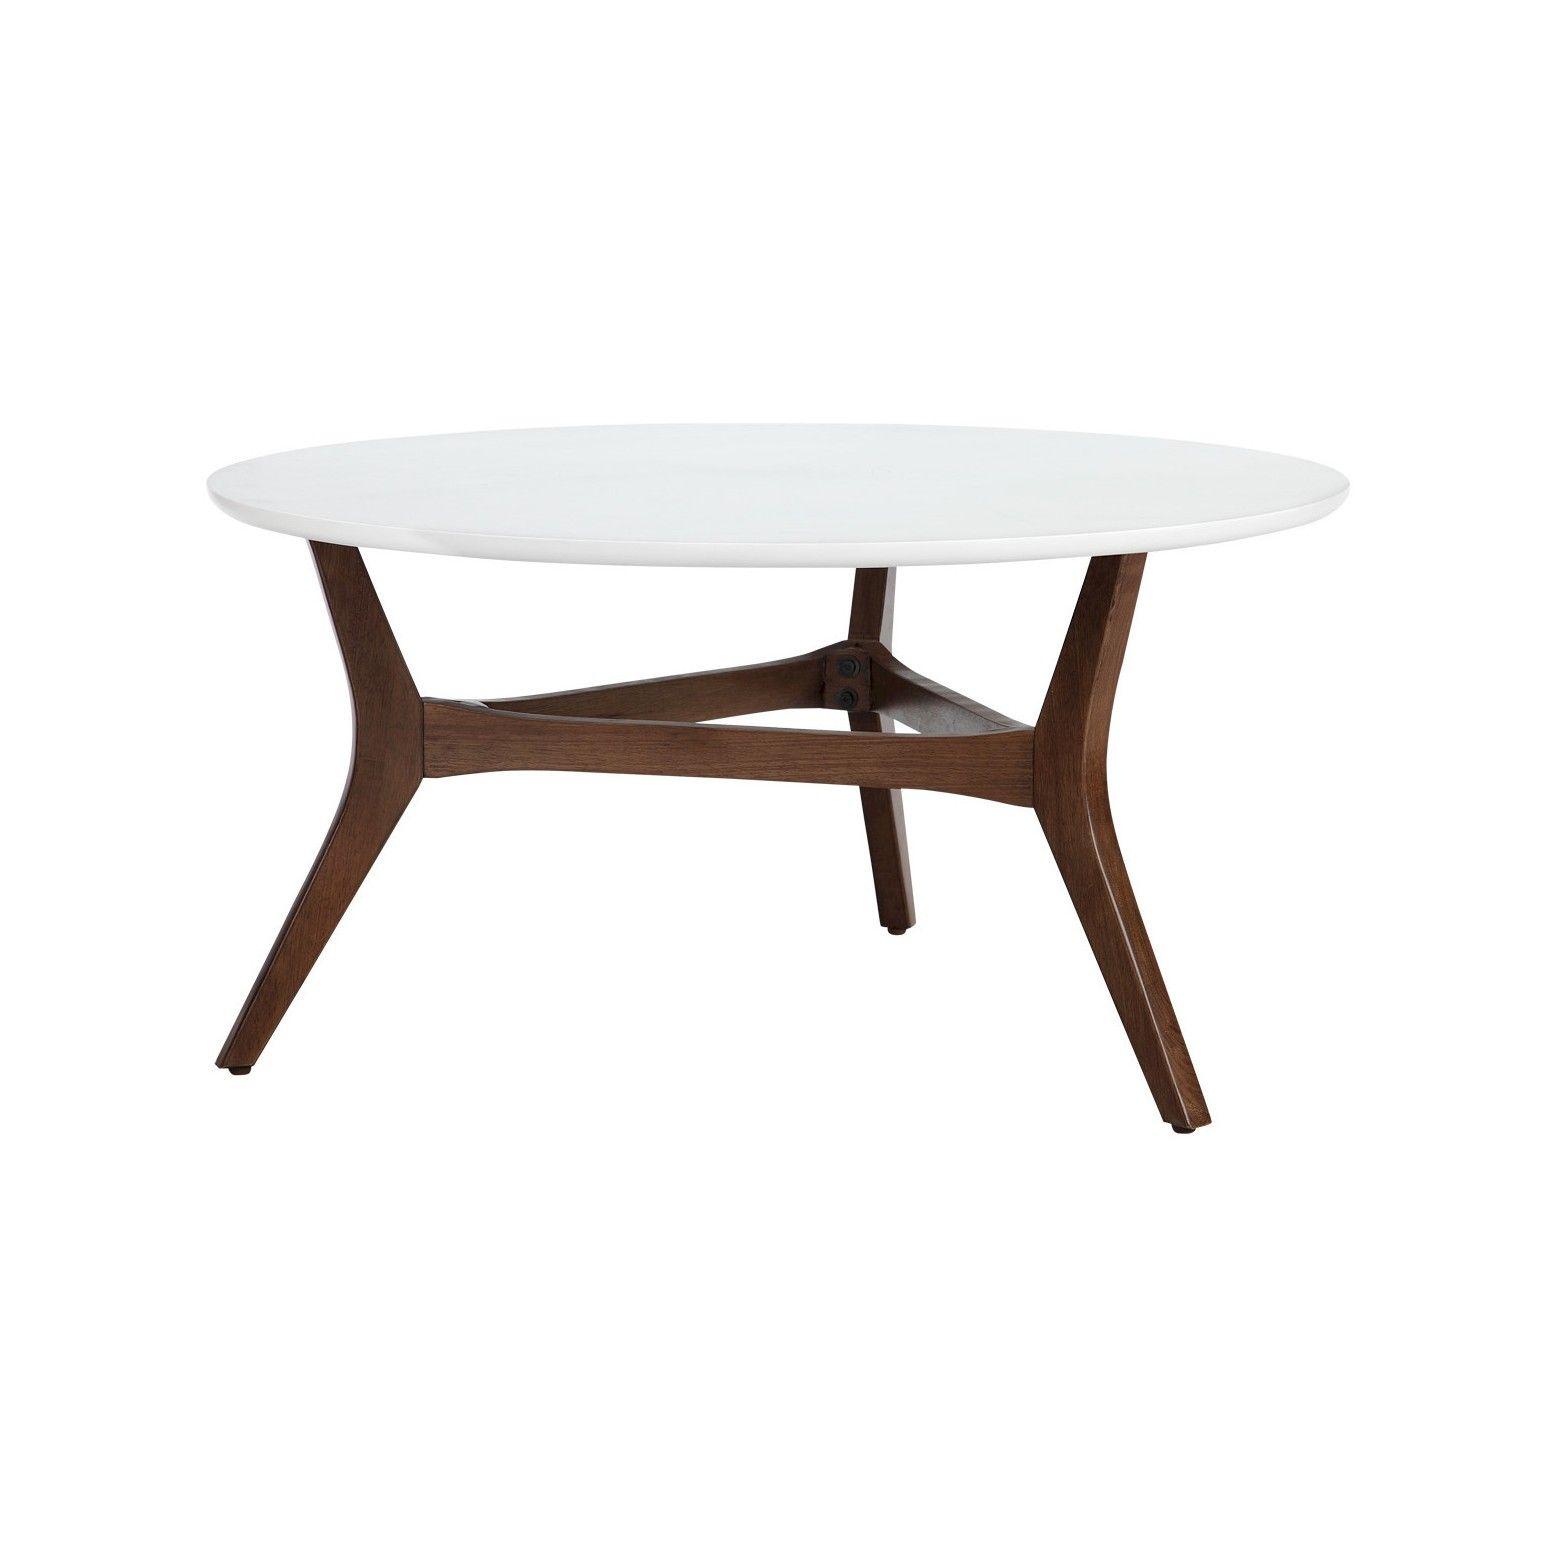 Emmond Two Tone Mid Century Modern Coffee Table Project 62 Modern Coffee Tables Mid Century Modern Coffee Table Coffee Table [ 1560 x 1560 Pixel ]